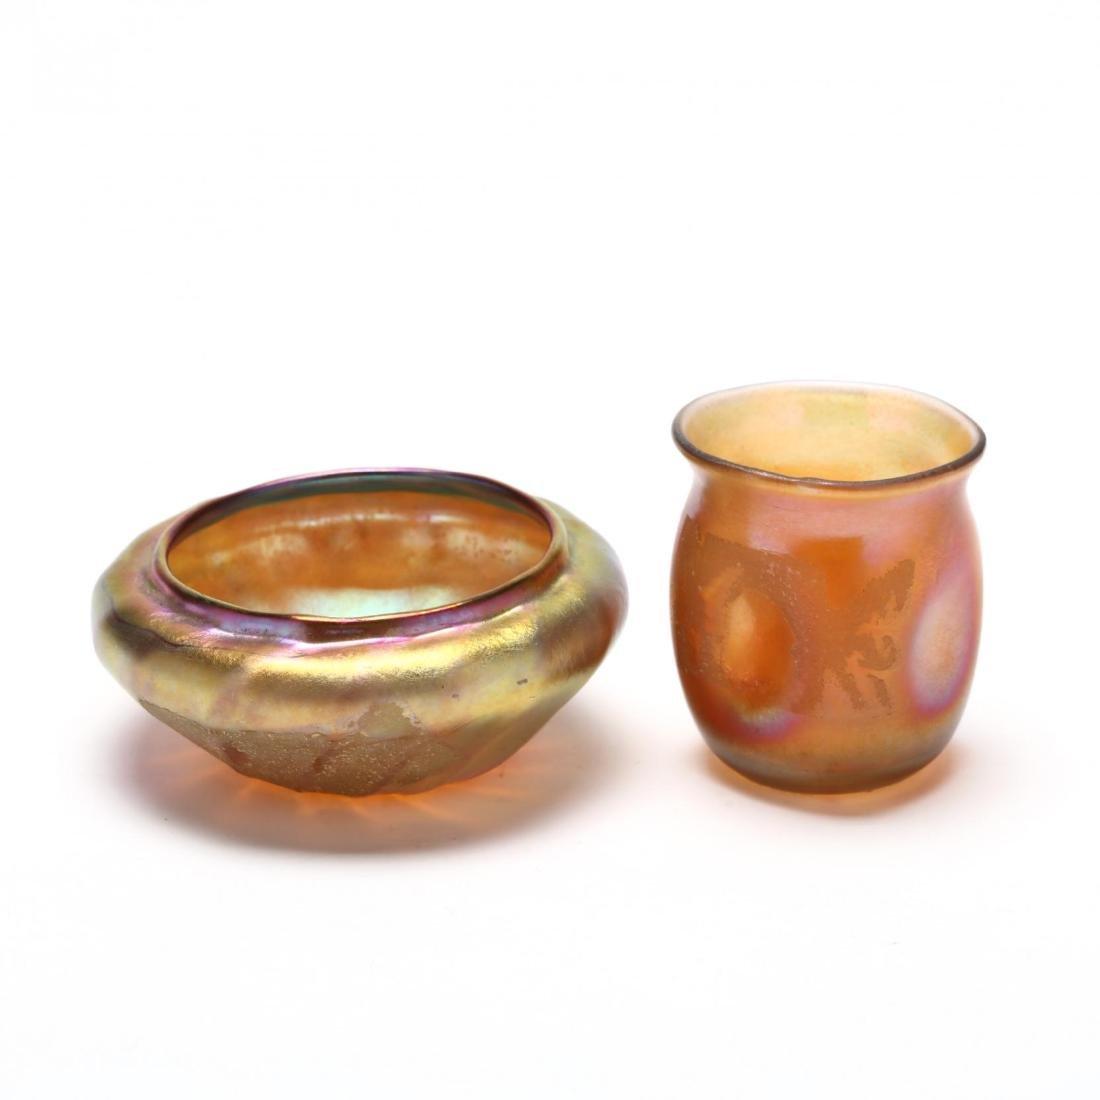 L.C. Tiffany, Seven Pieces of Favrile Art Glass - 4